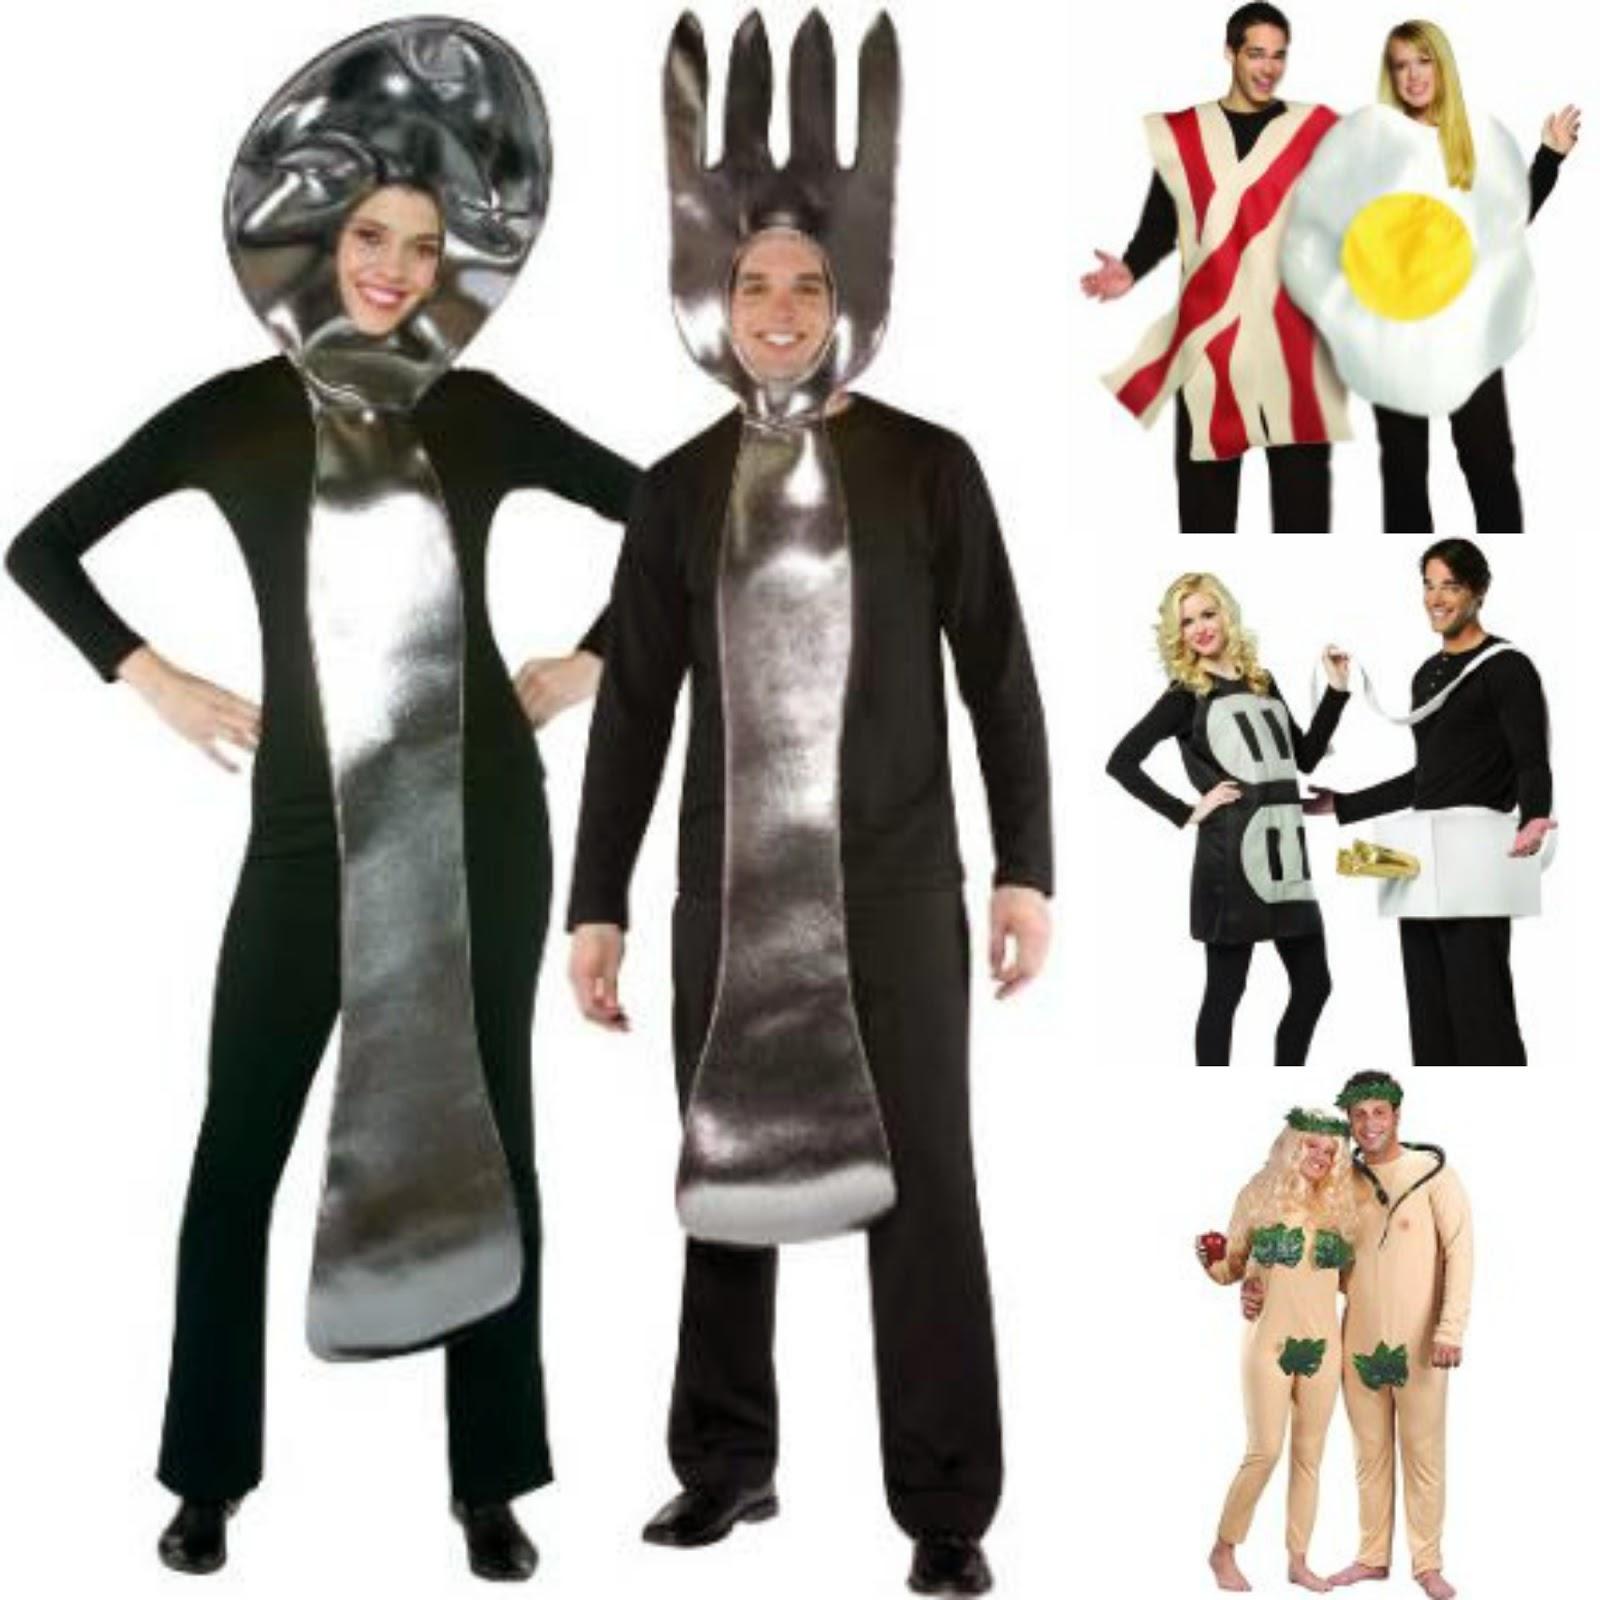 Spoon u0026 Fork // Bacon u0026 Eggs // Plug u0026 Socket // Adam u0026 Eve  sc 1 st  The Mosbys in China & My Best u0026 Worst Halloween | The Mosbys in China